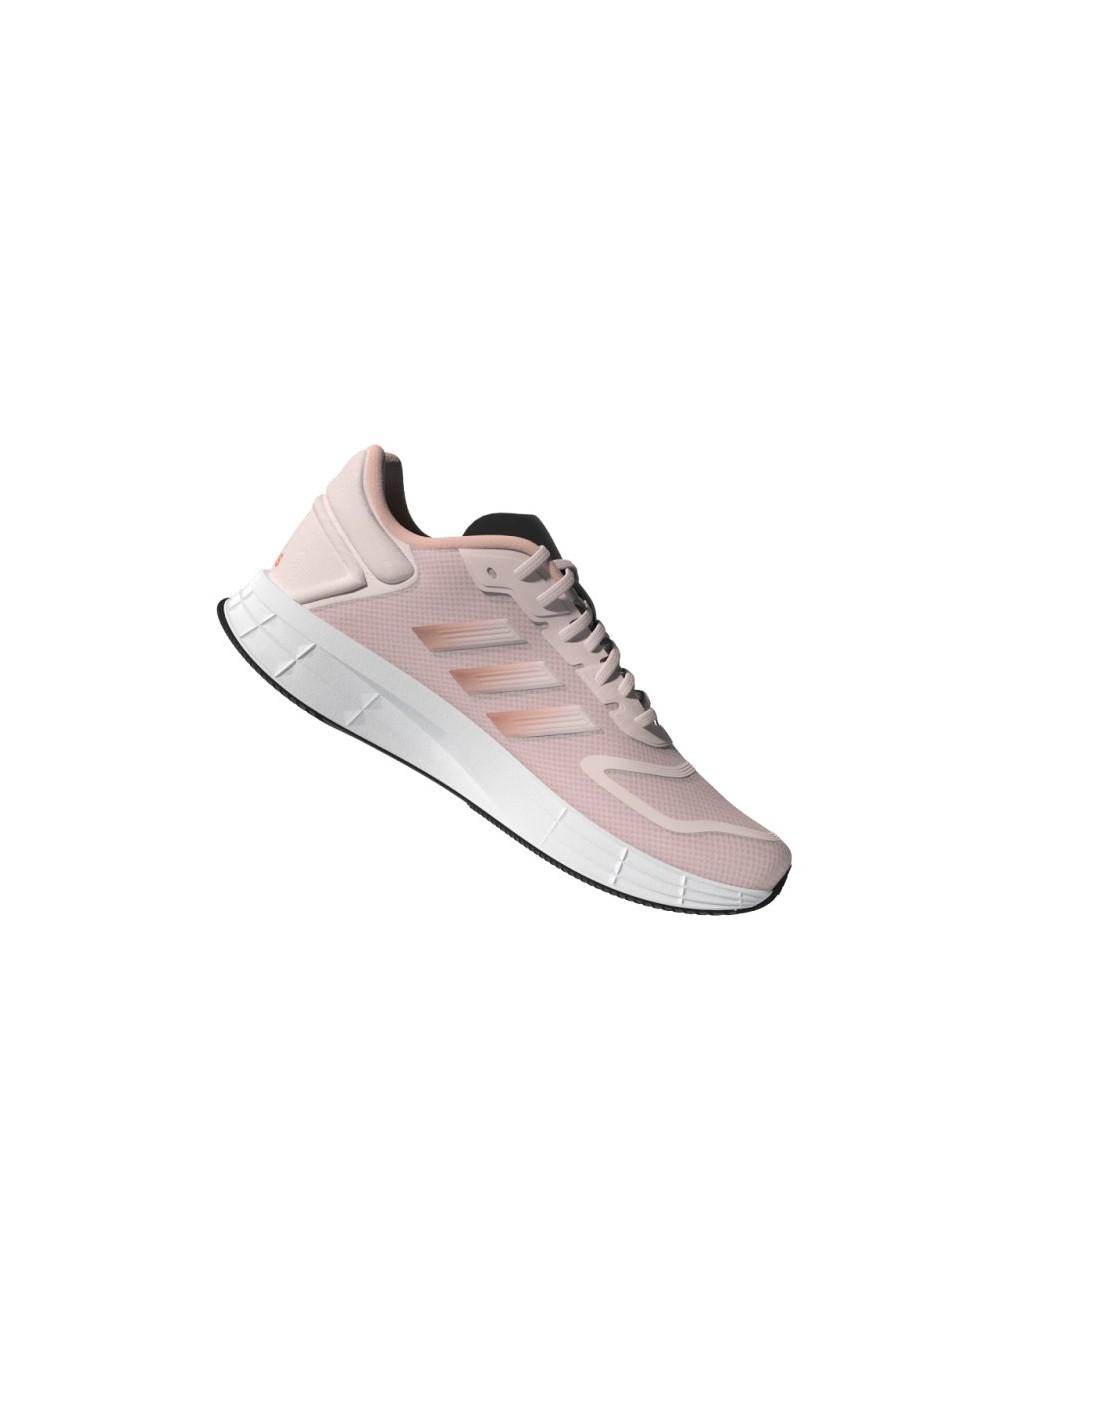 Balon NIKE STRIKE LA LIGA 16-17 WHITE-OR - TURINI 77e4c54d296f2